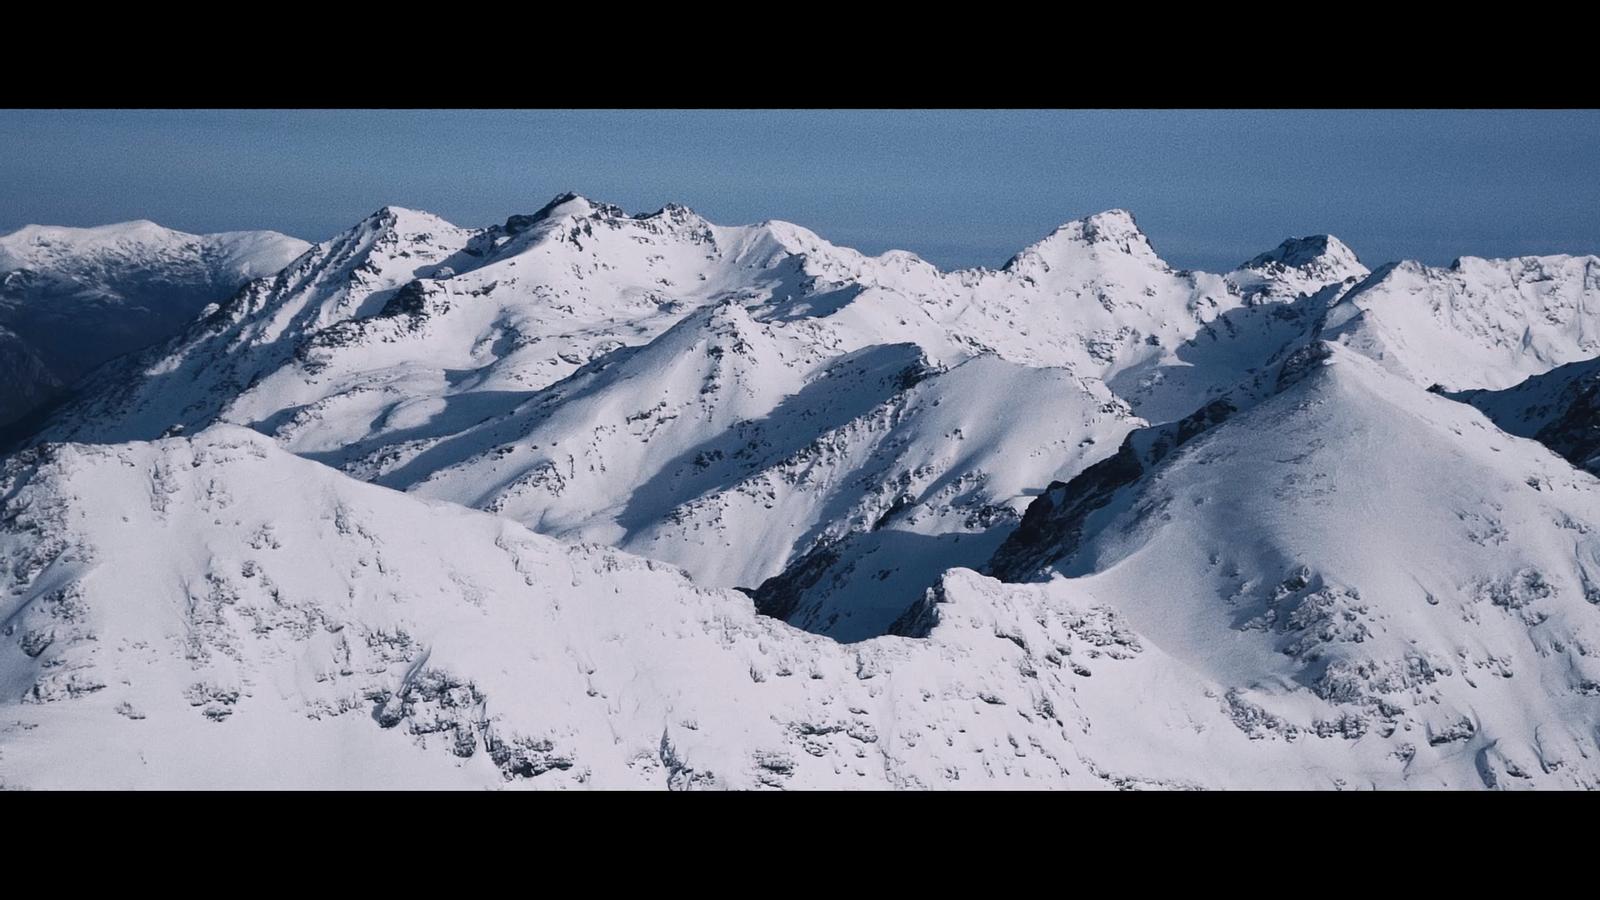 Campanya publicitària d'Andorra Turisme per a l'hivern